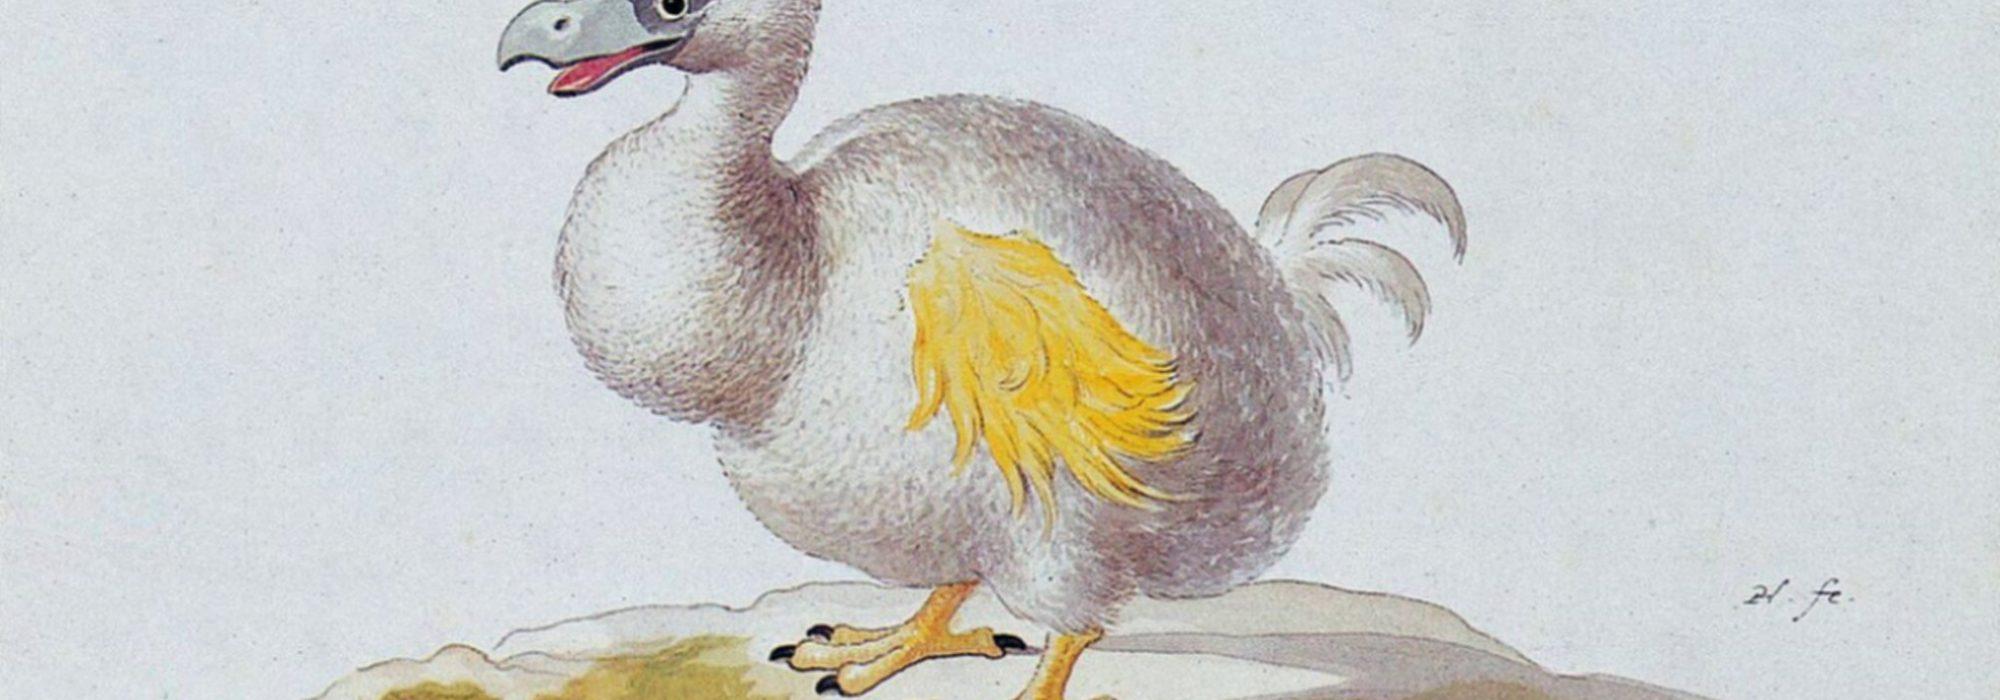 Imagem: Dodô Branco (Pieter Holsteyn, 1638)